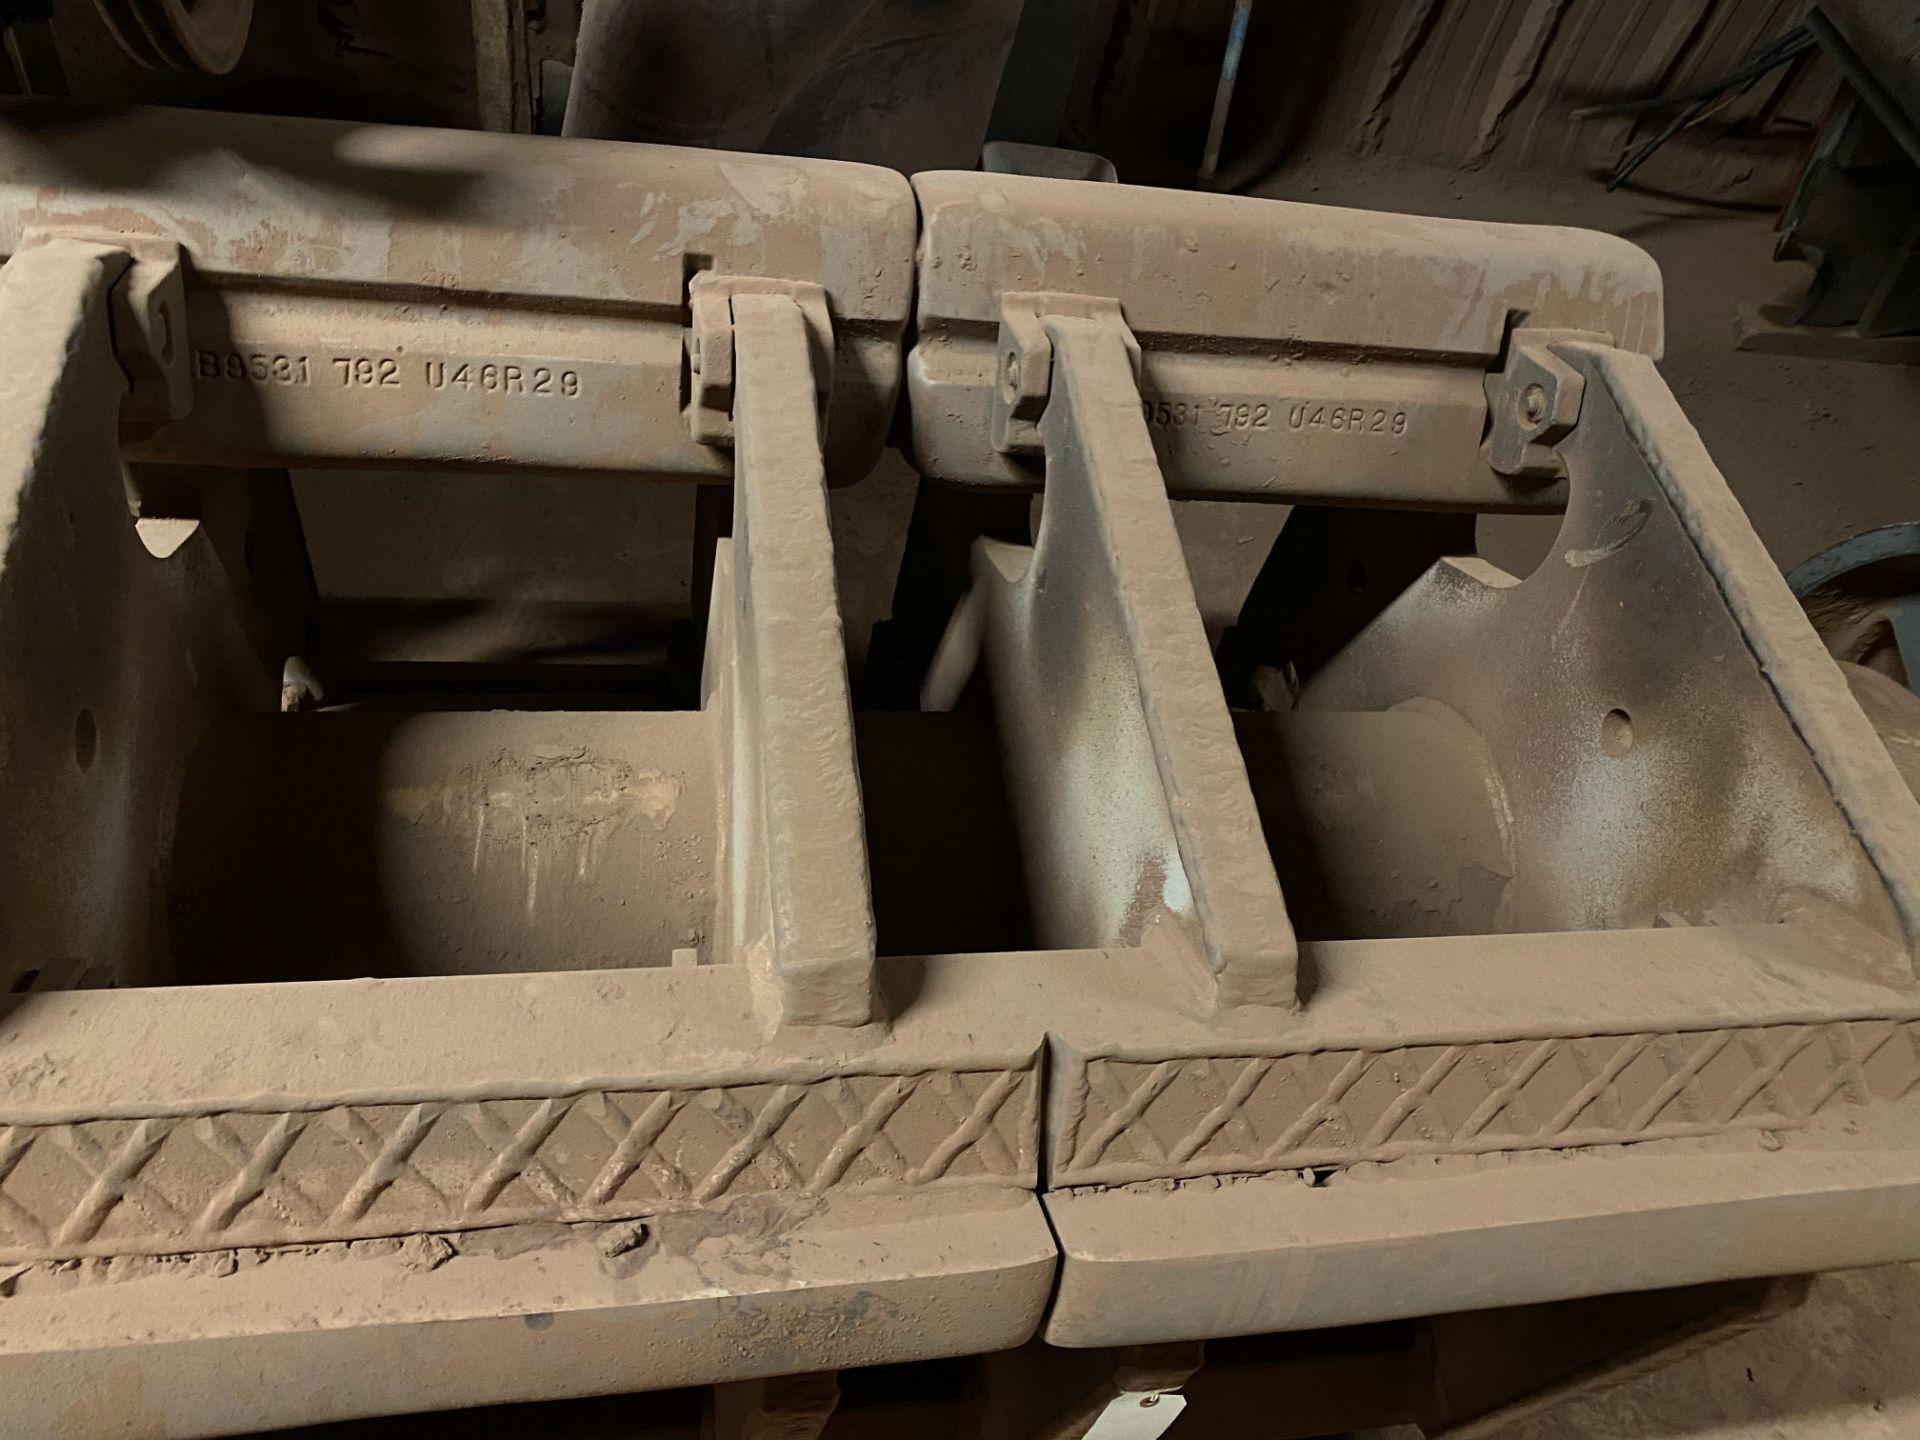 HAZEMAG IMPACT CRUSHER, MODEL 1315, 60'' DIAMETER ROTOR, 60'' WIDE, 575V, 450 HP - Image 9 of 25